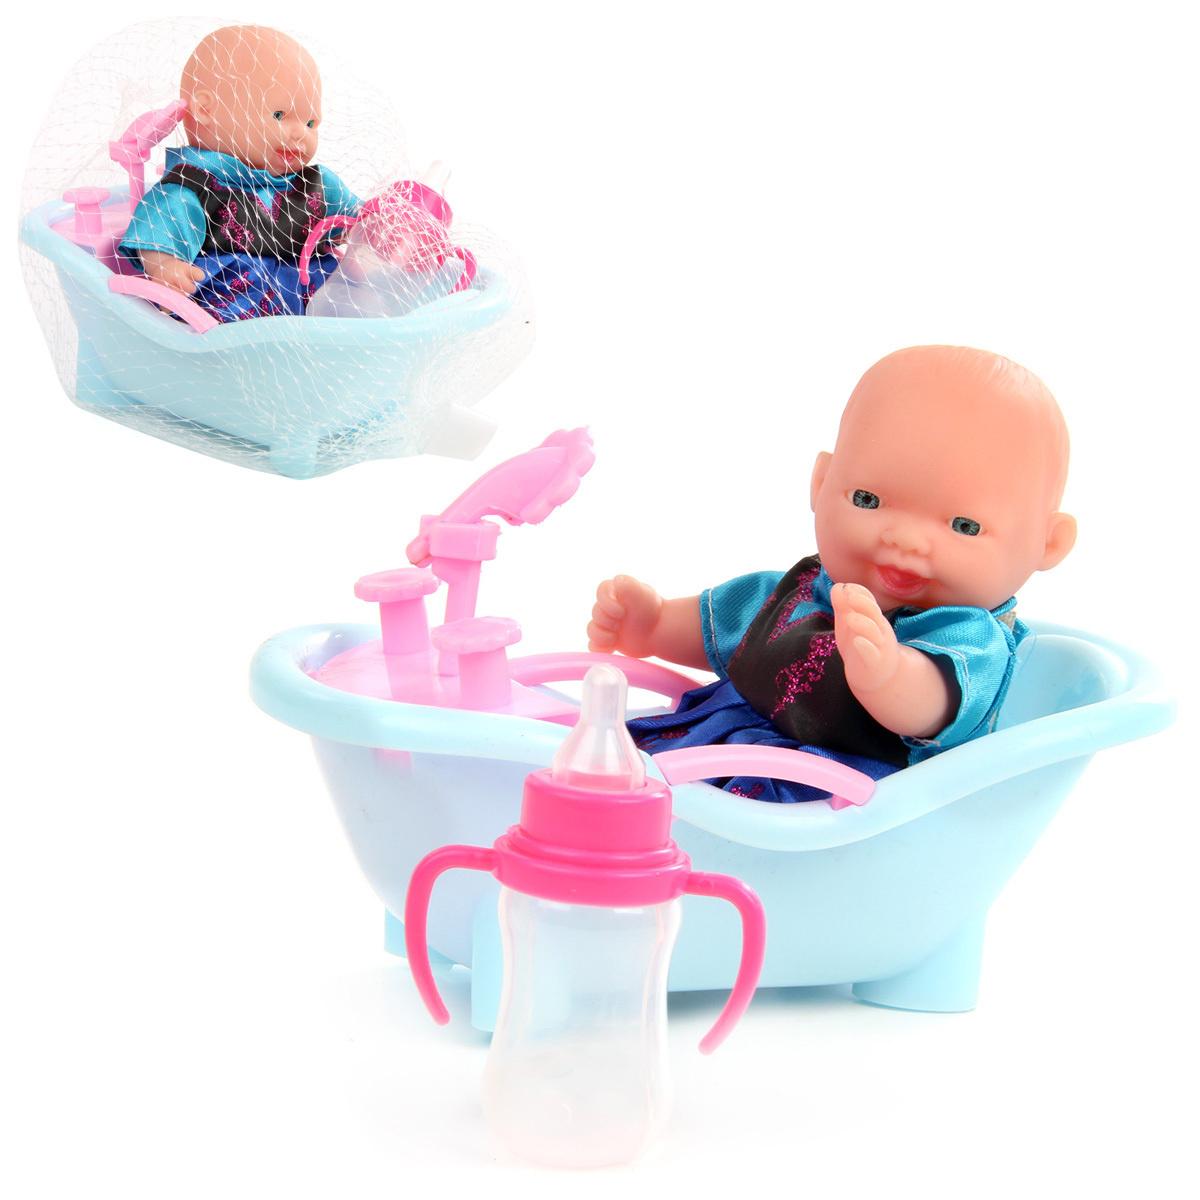 Пупс в ванной, Veld Co #1